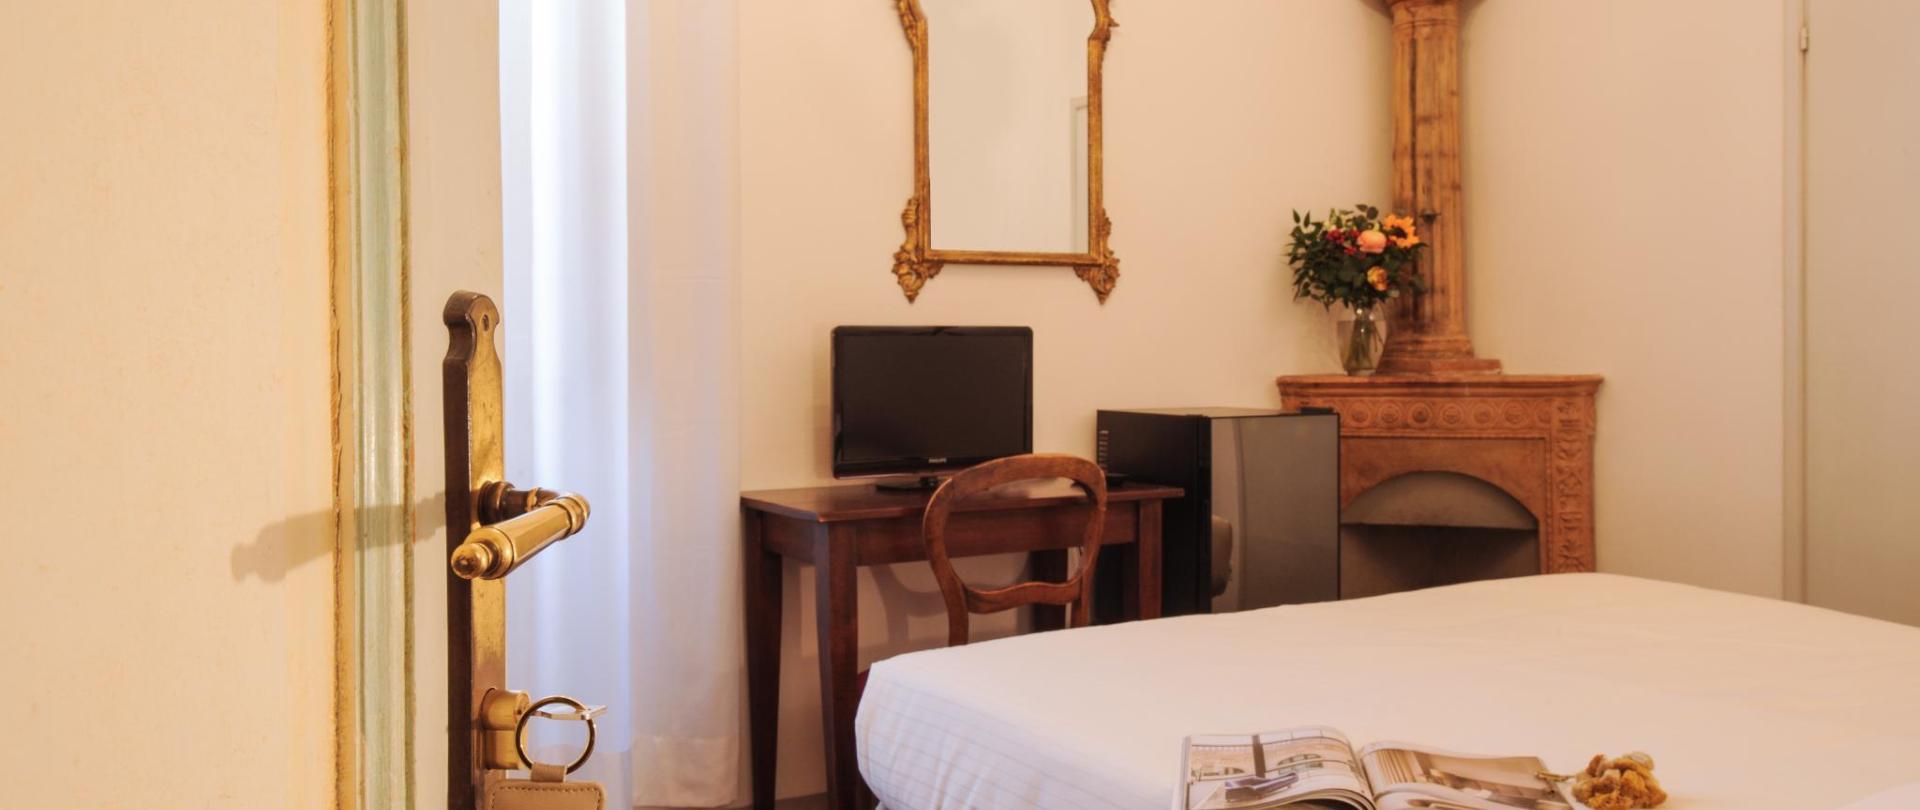 hotelannalena-23.jpg